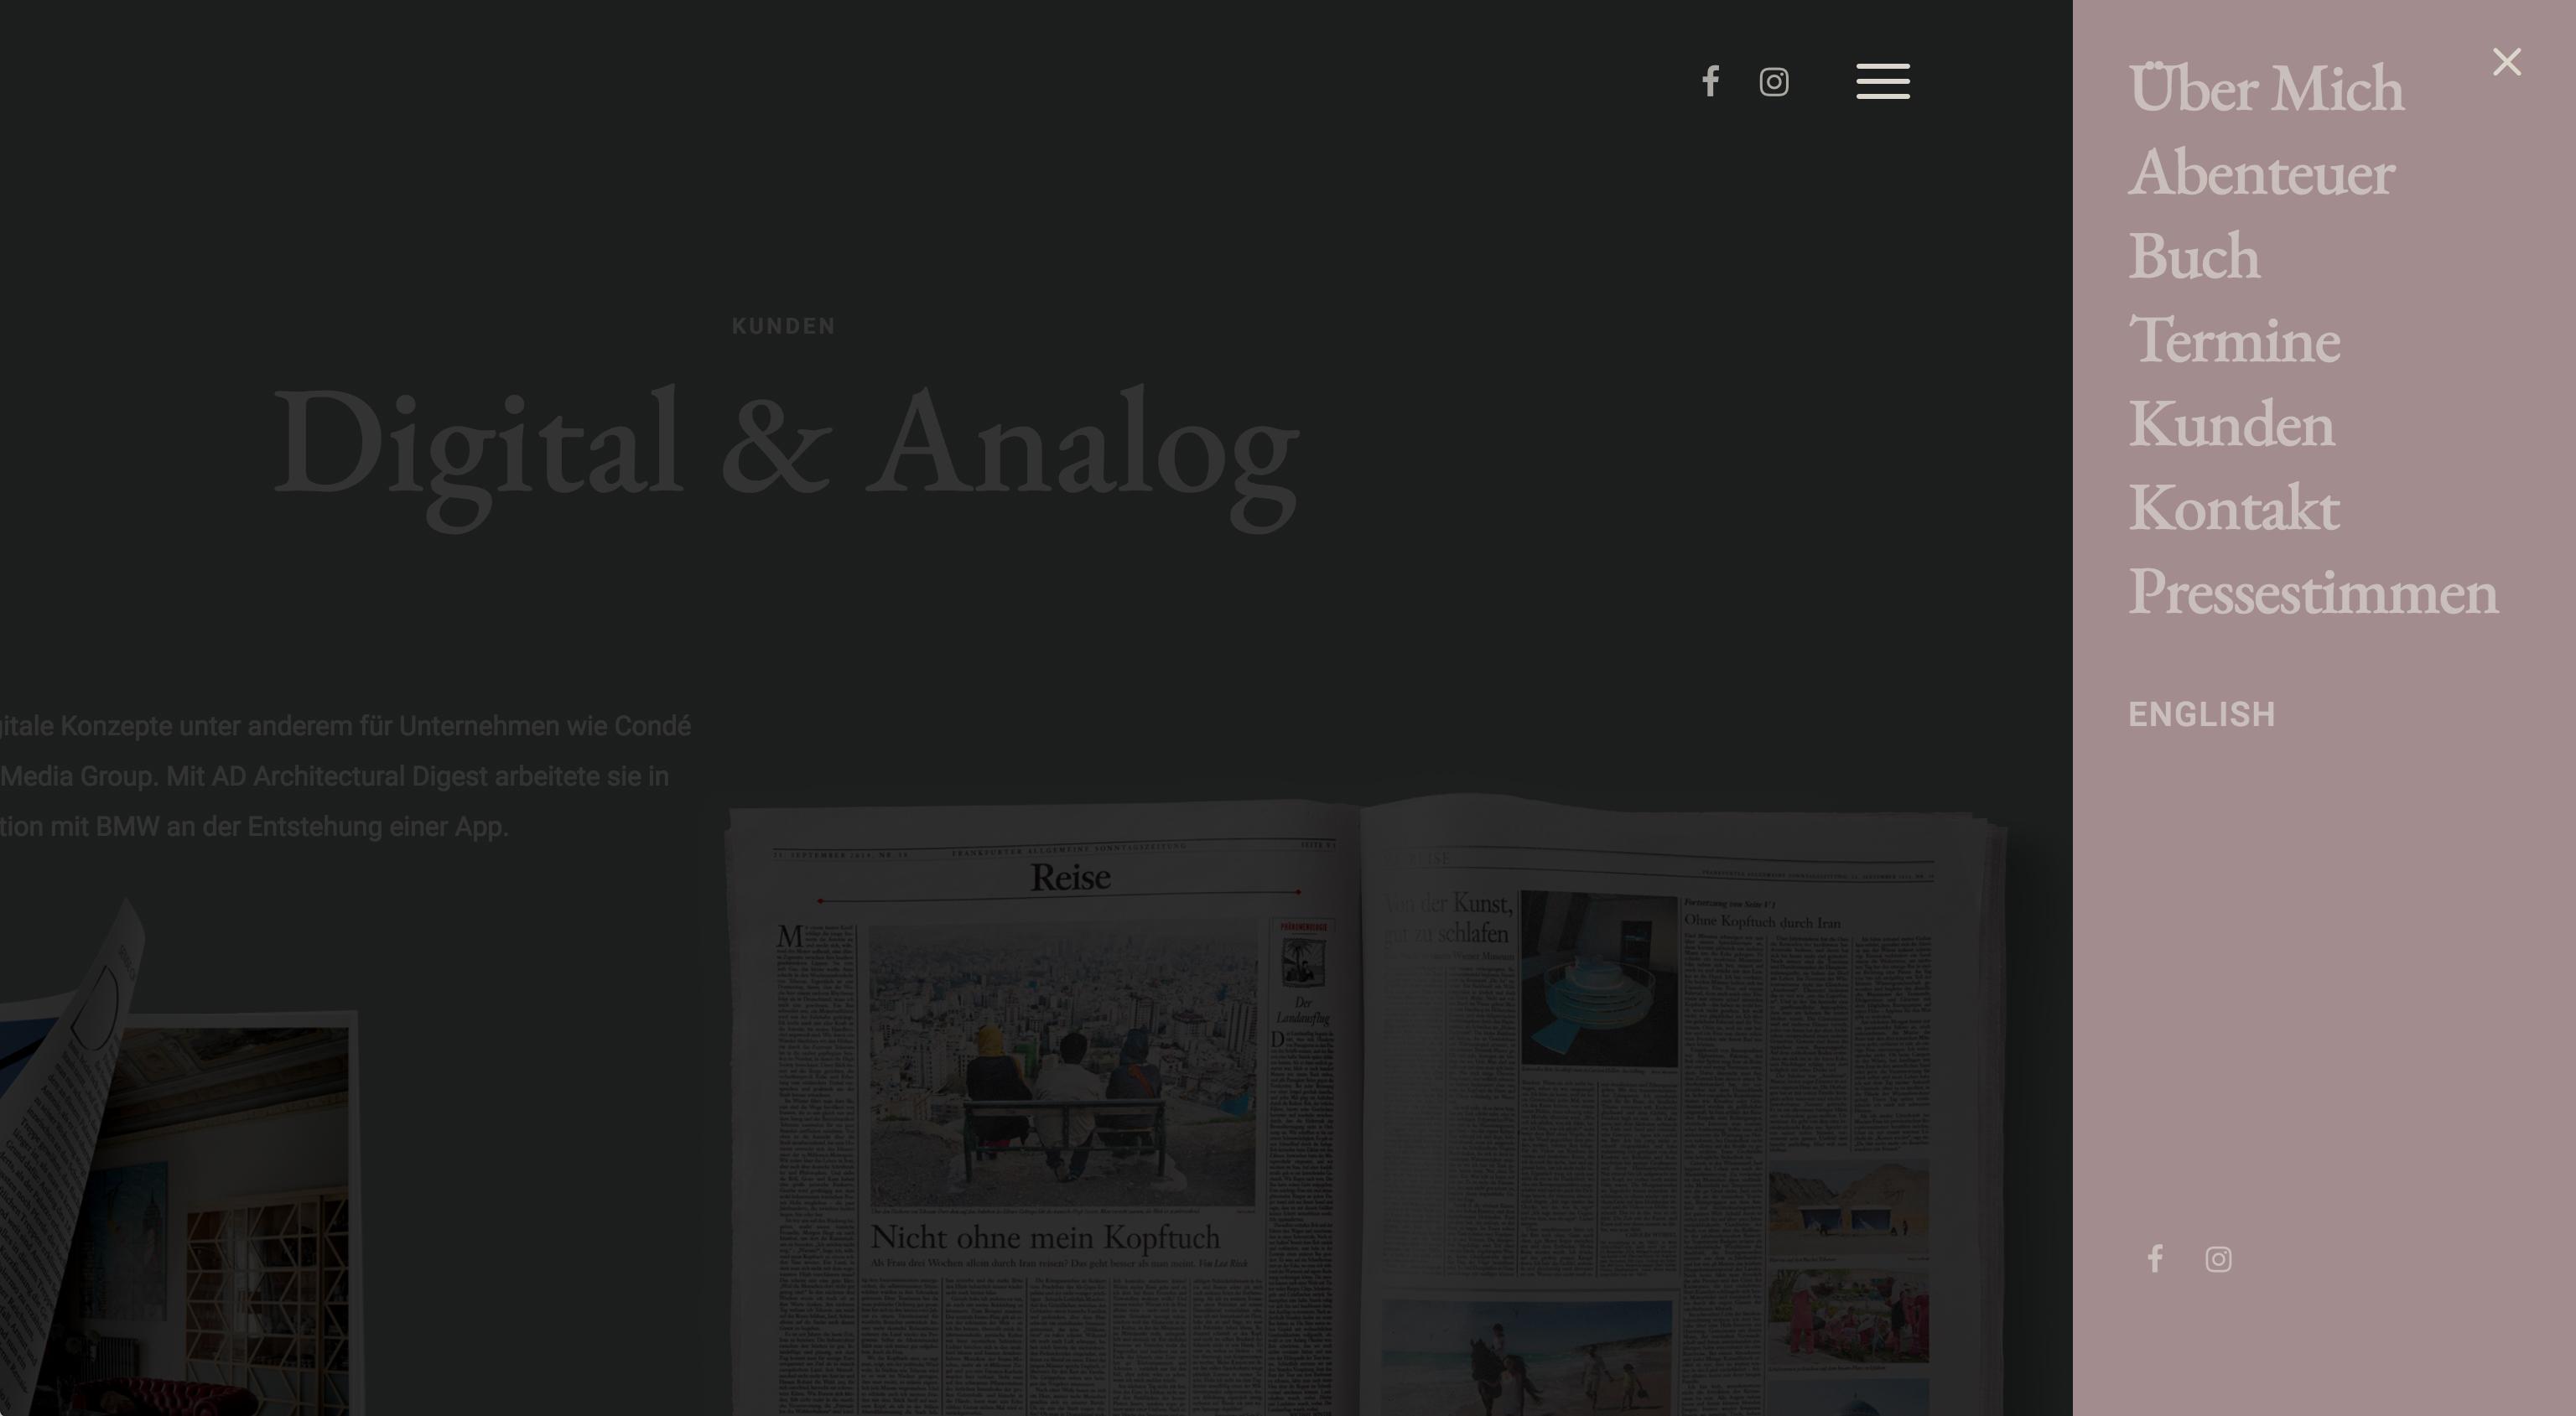 Lea Rieck Website designed by Tobias Heumann